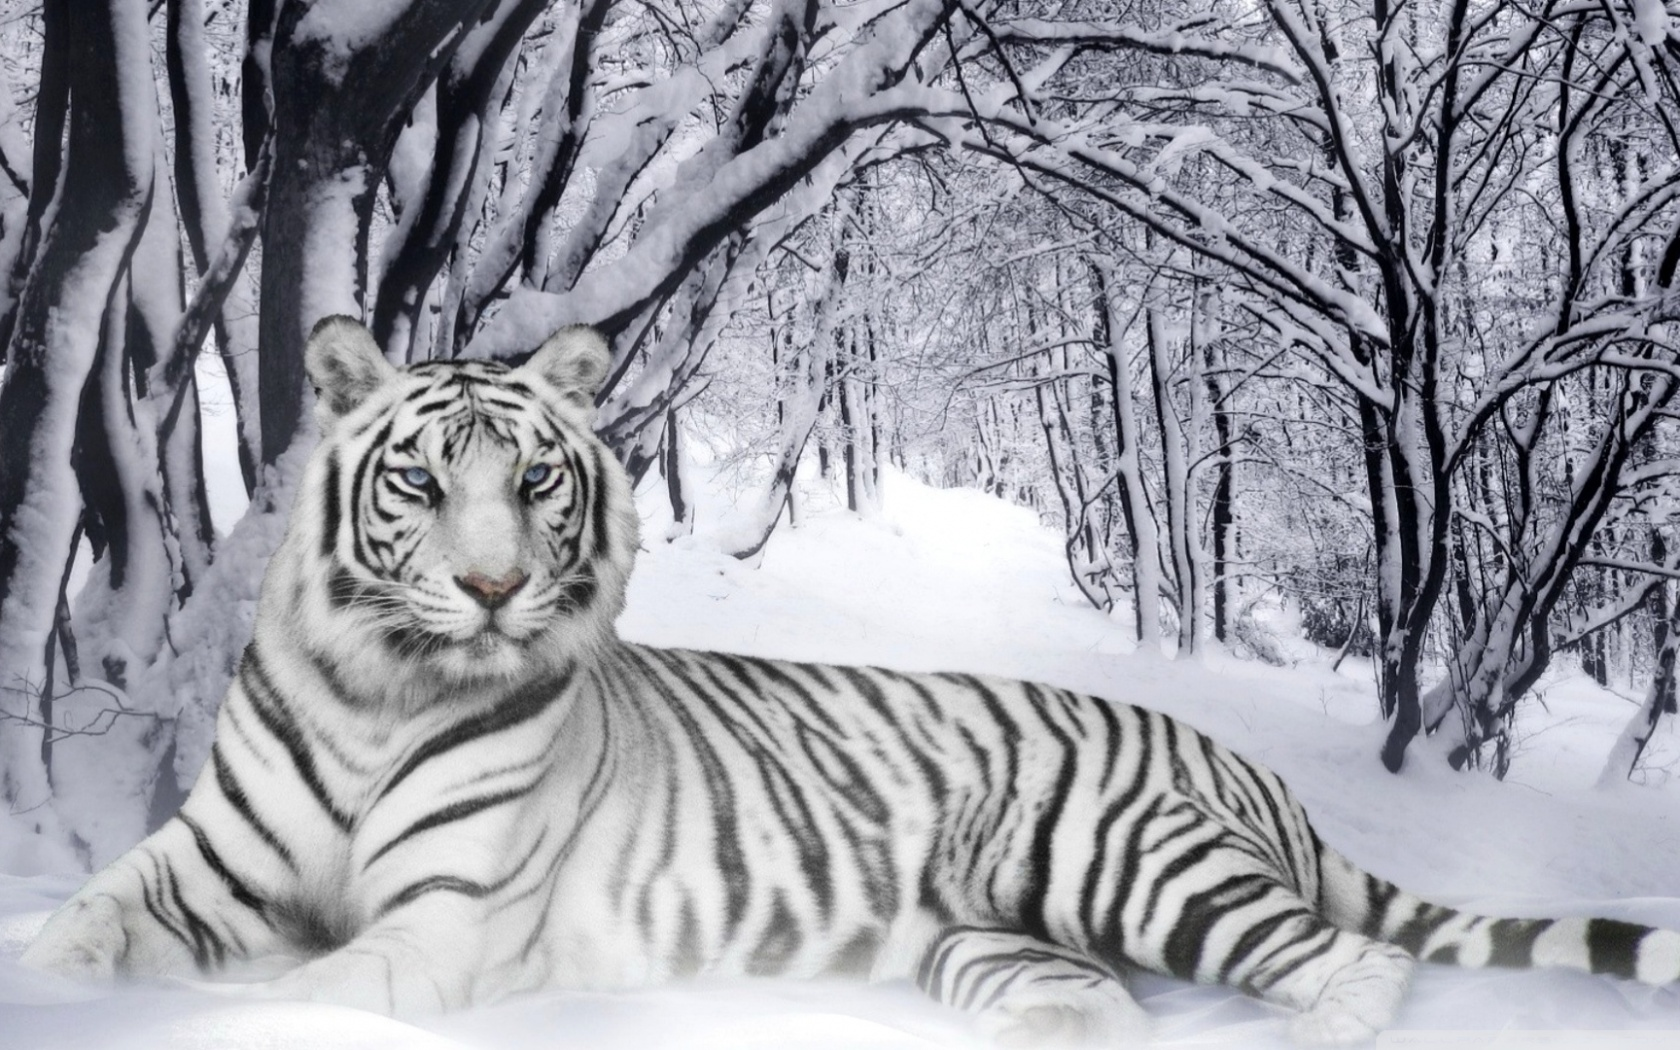 bengal_tiger-wallpaper-1680x1050.jpg